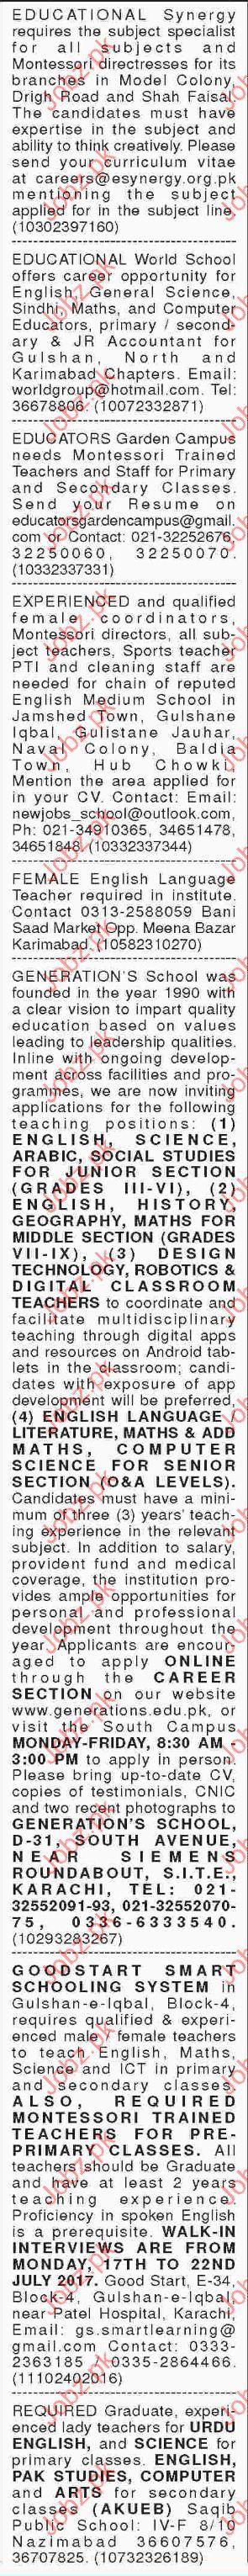 Montessori Directresses Required